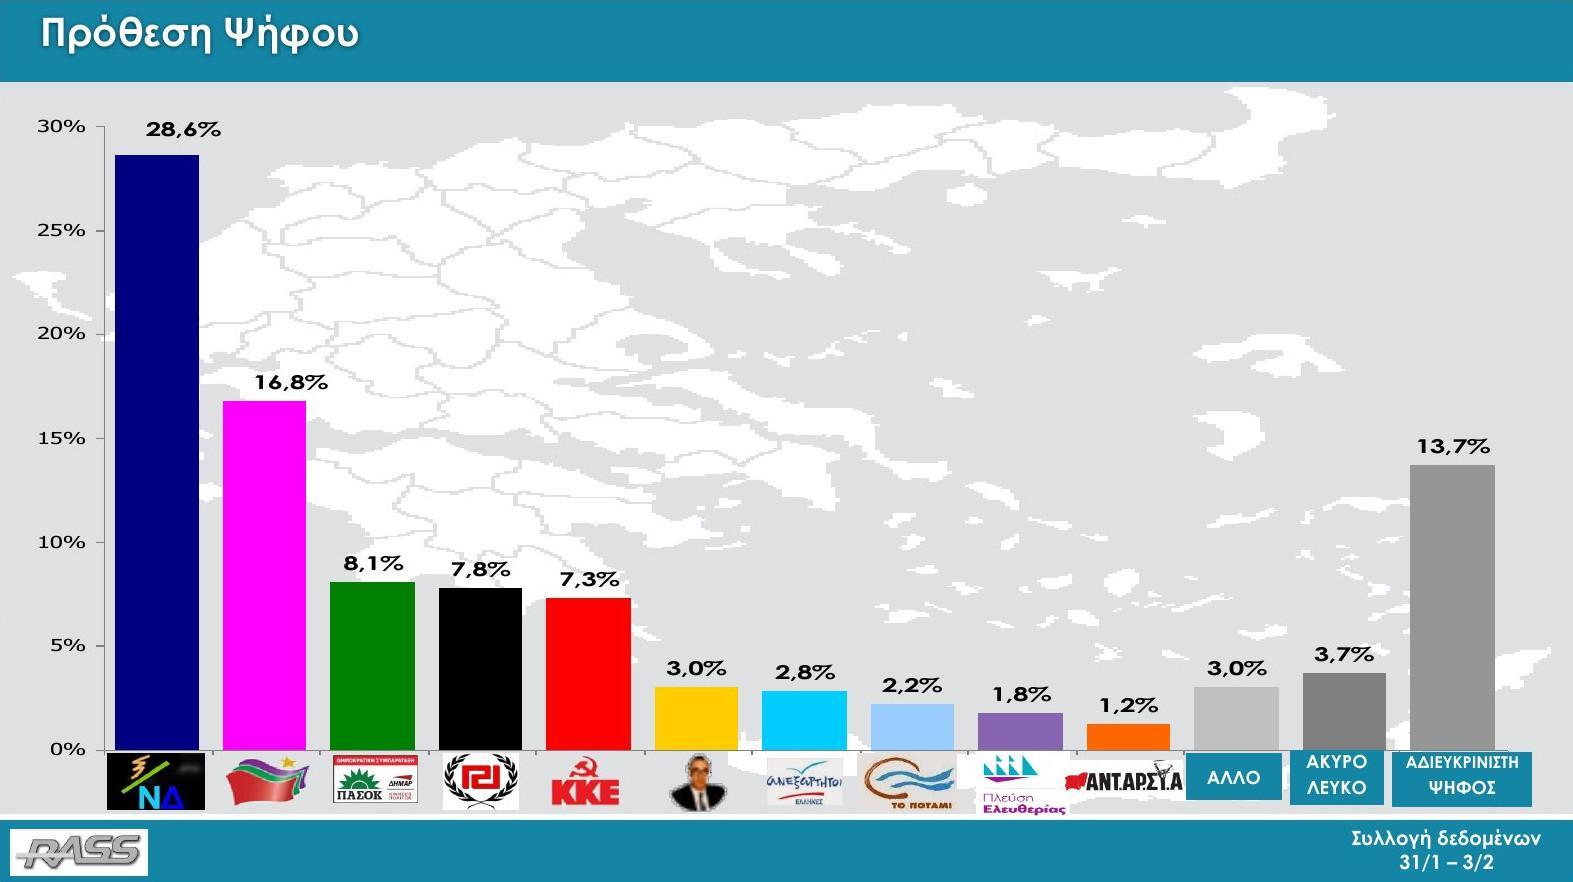 rass-43-1 Δημοσκόπηση Rass: Πρώτη με 11,8% διαφορά η ΝΔ από τον ΣΥΡΙΖΑ